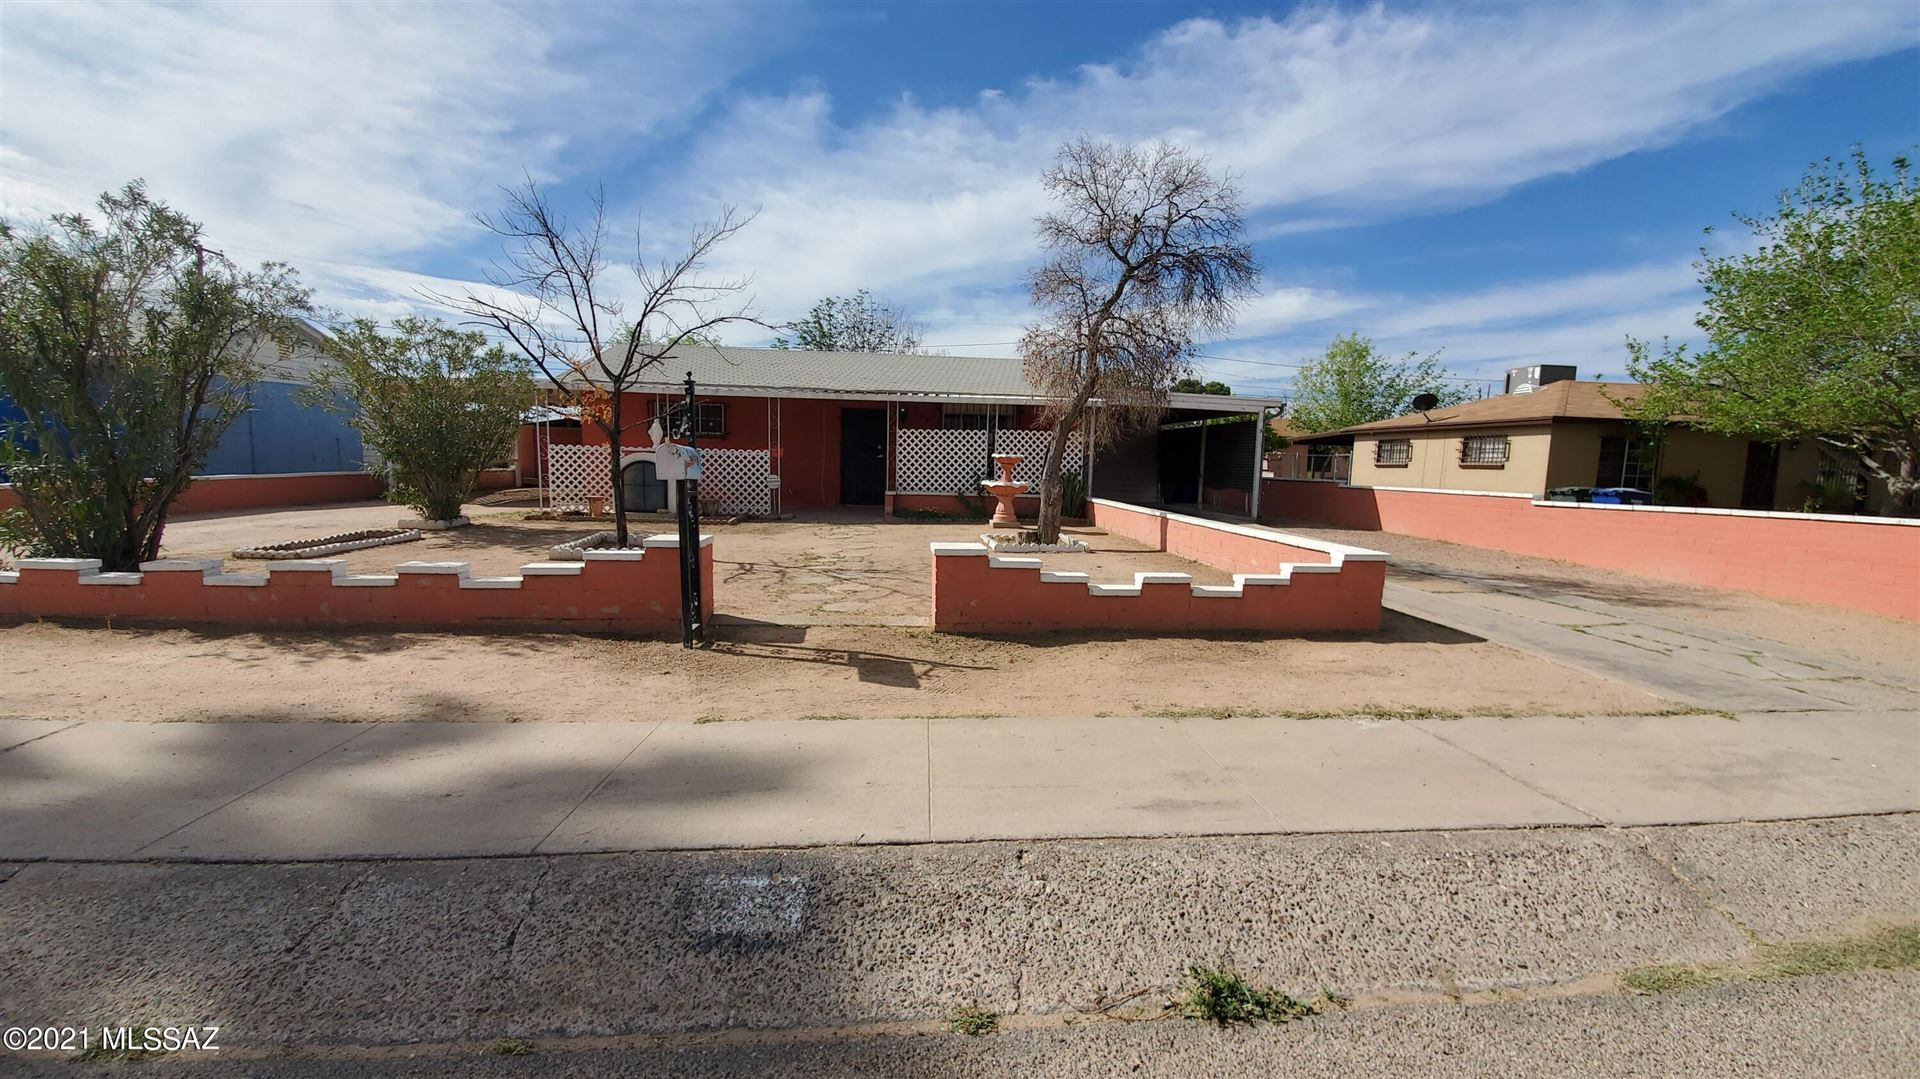 717 W Santa Paula Street, Tucson, AZ 85706 - MLS#: 22109270